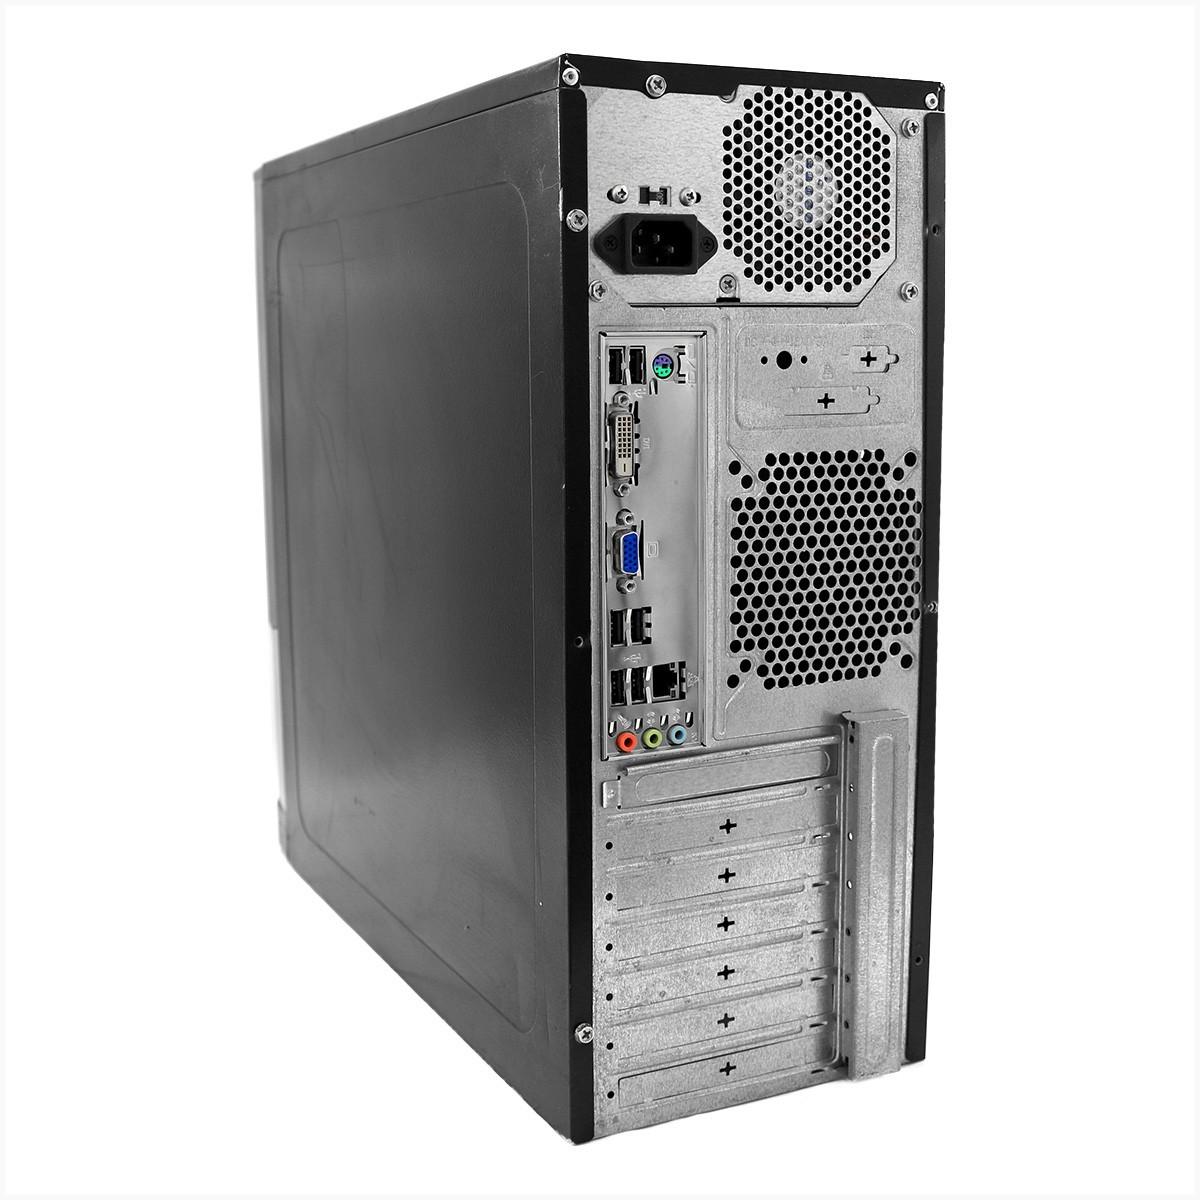 Desktop asus micro tools i7 8gb 500gb - usado